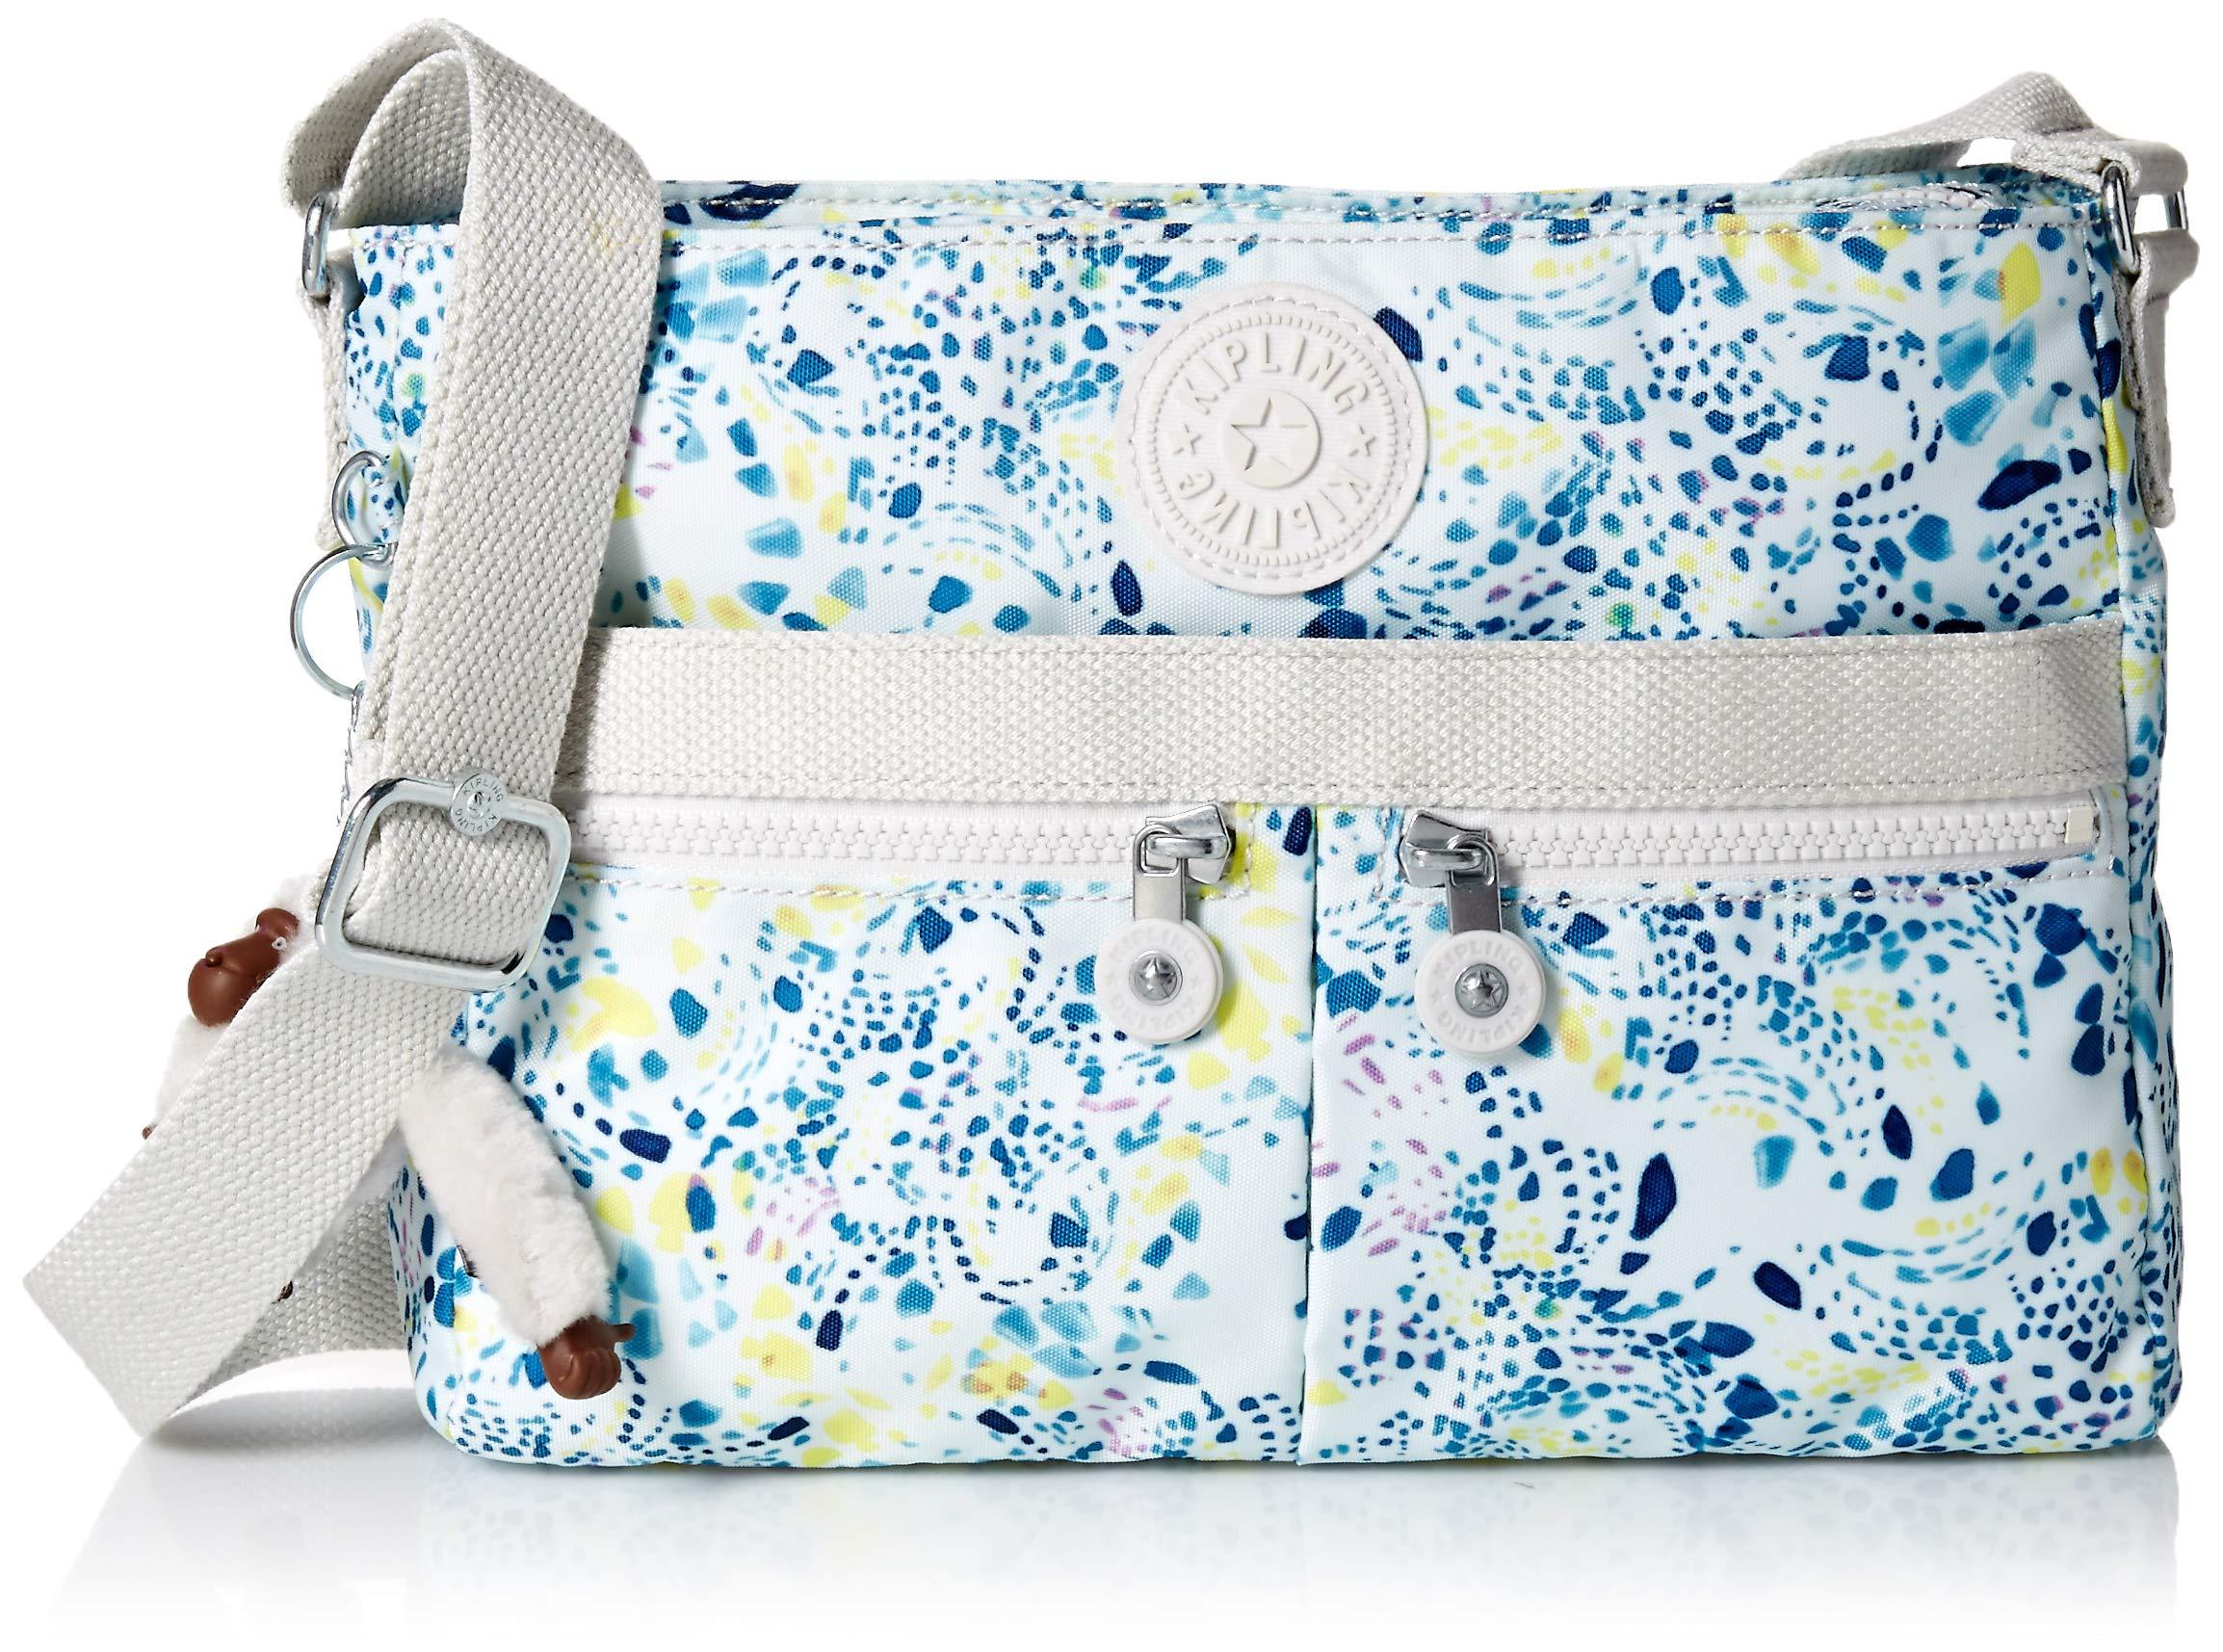 Kipling Women's Angie Crossbody Bag, Adjustable Shoulder Strap, Zip Closure, Delicate Vines